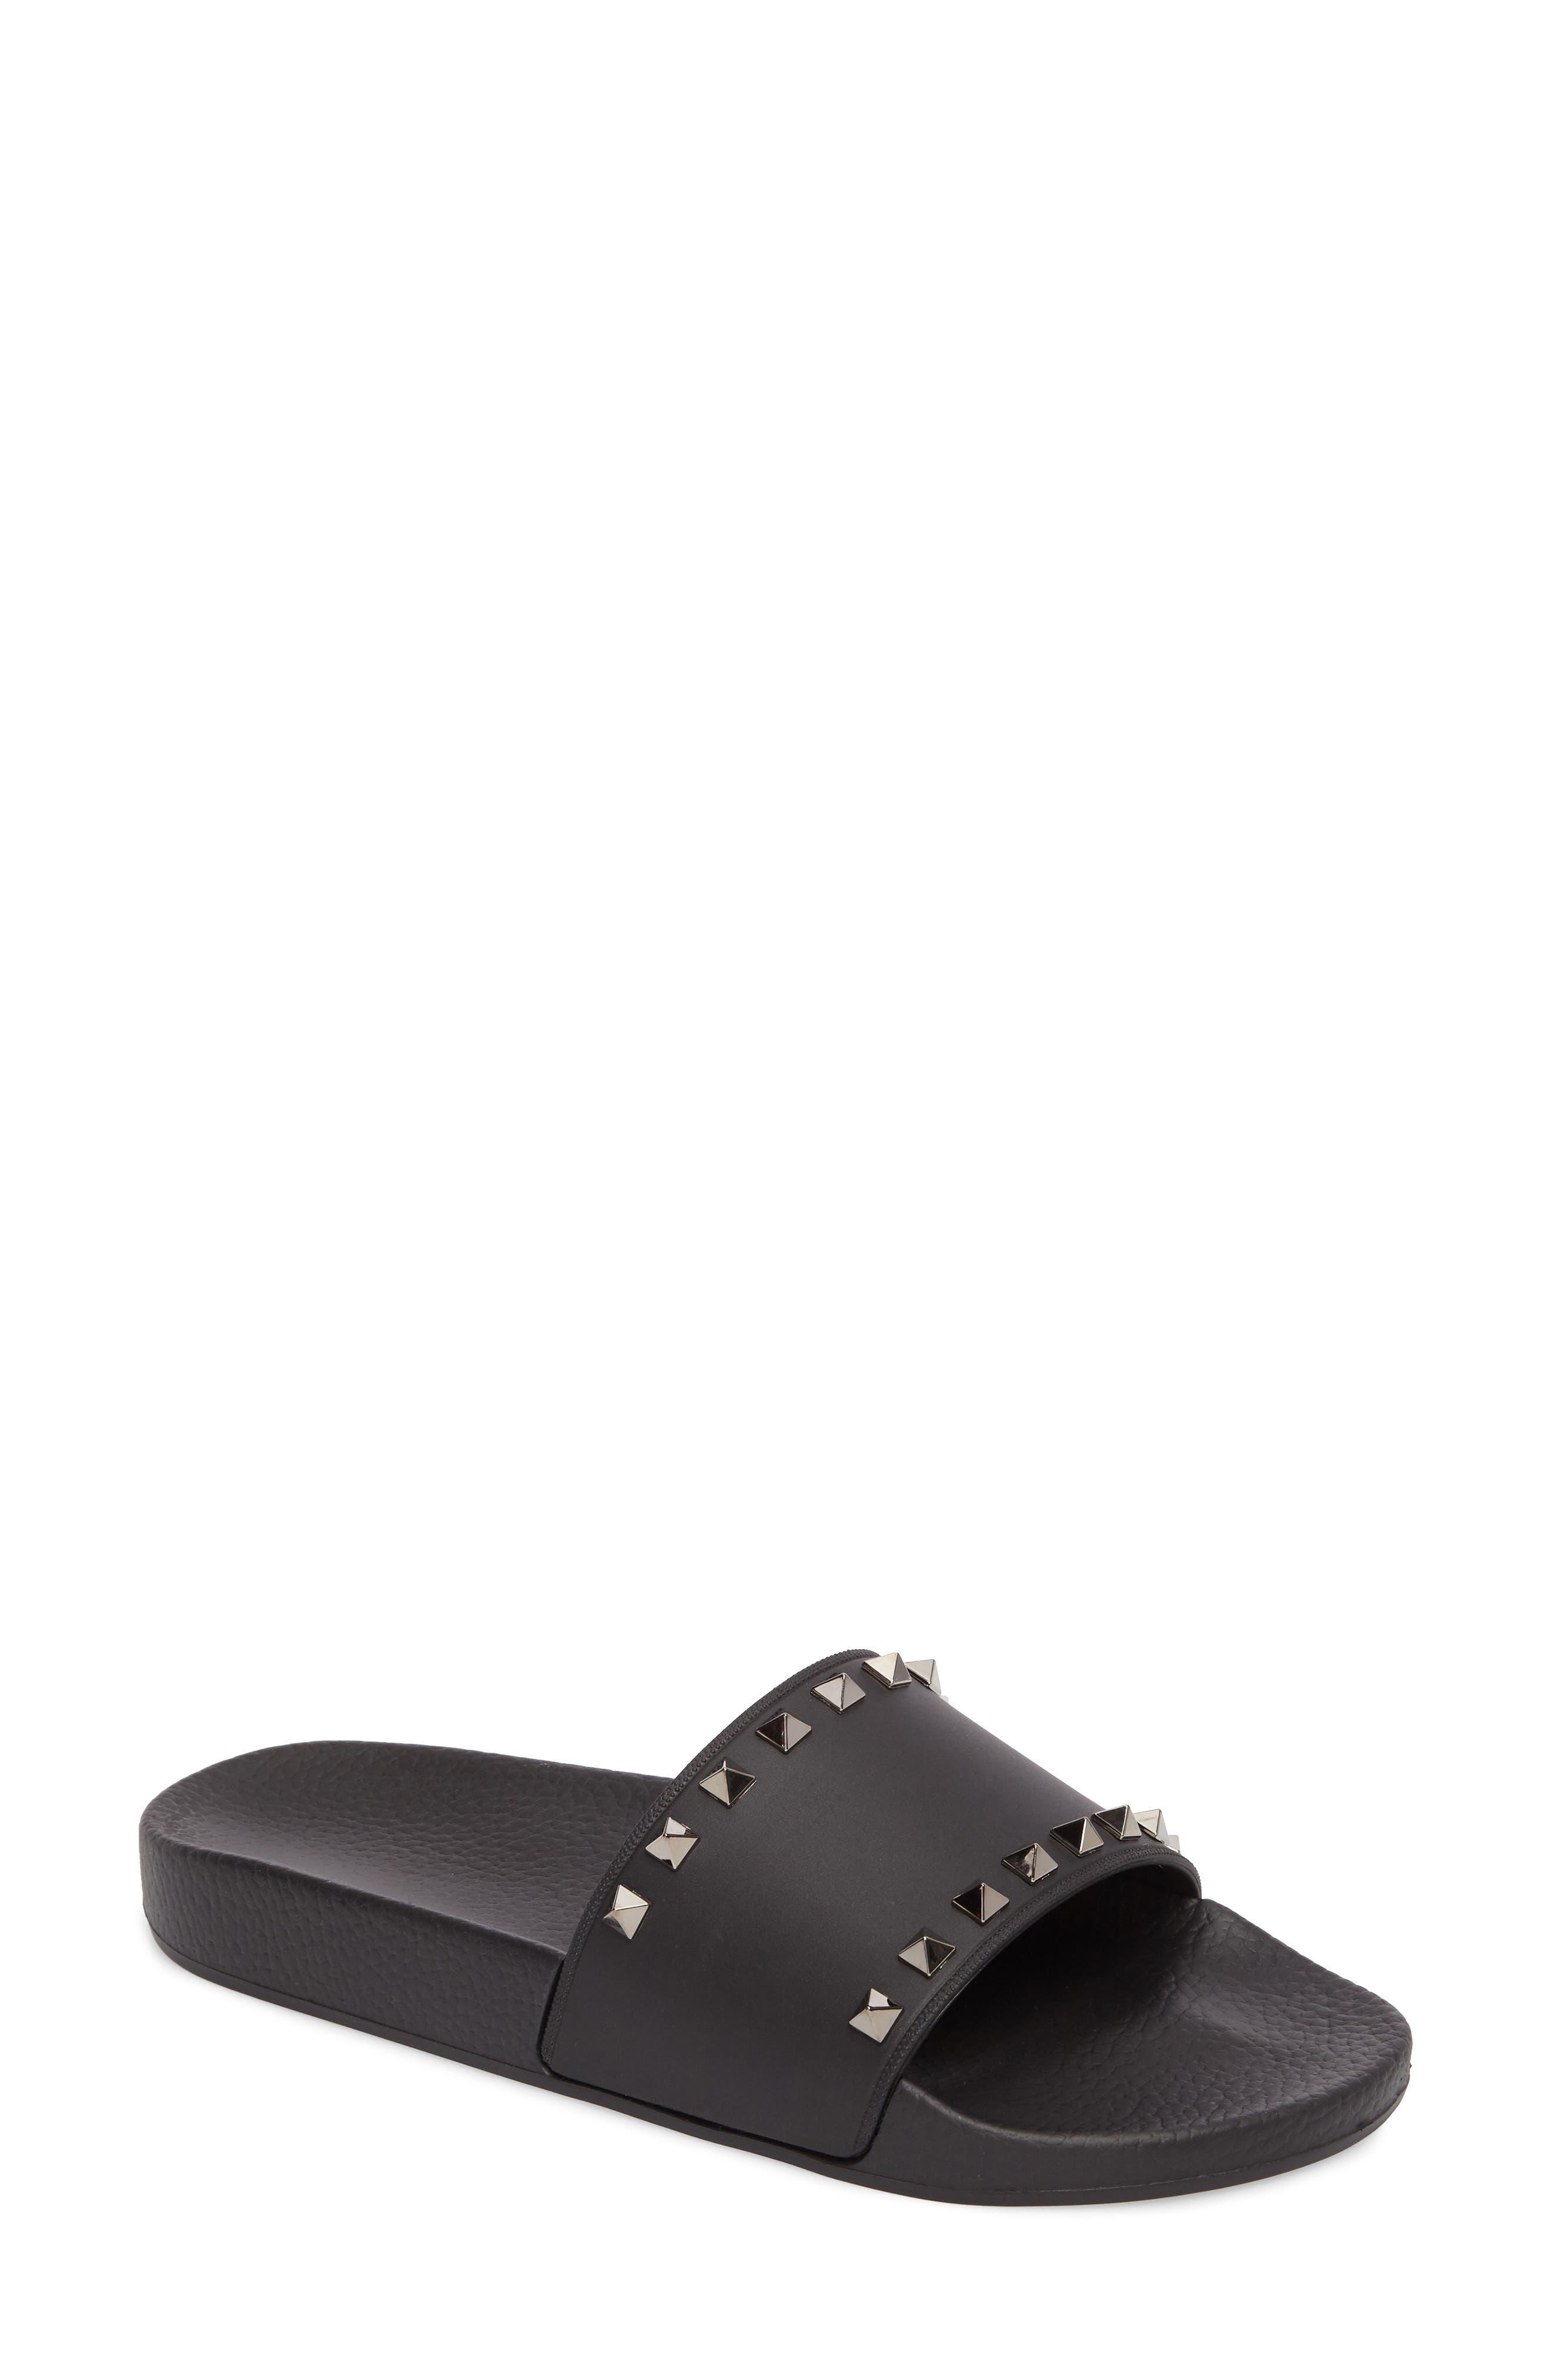 VALENTINO GARAVANI Rockstud Slide Sandal, Main, color, NERO